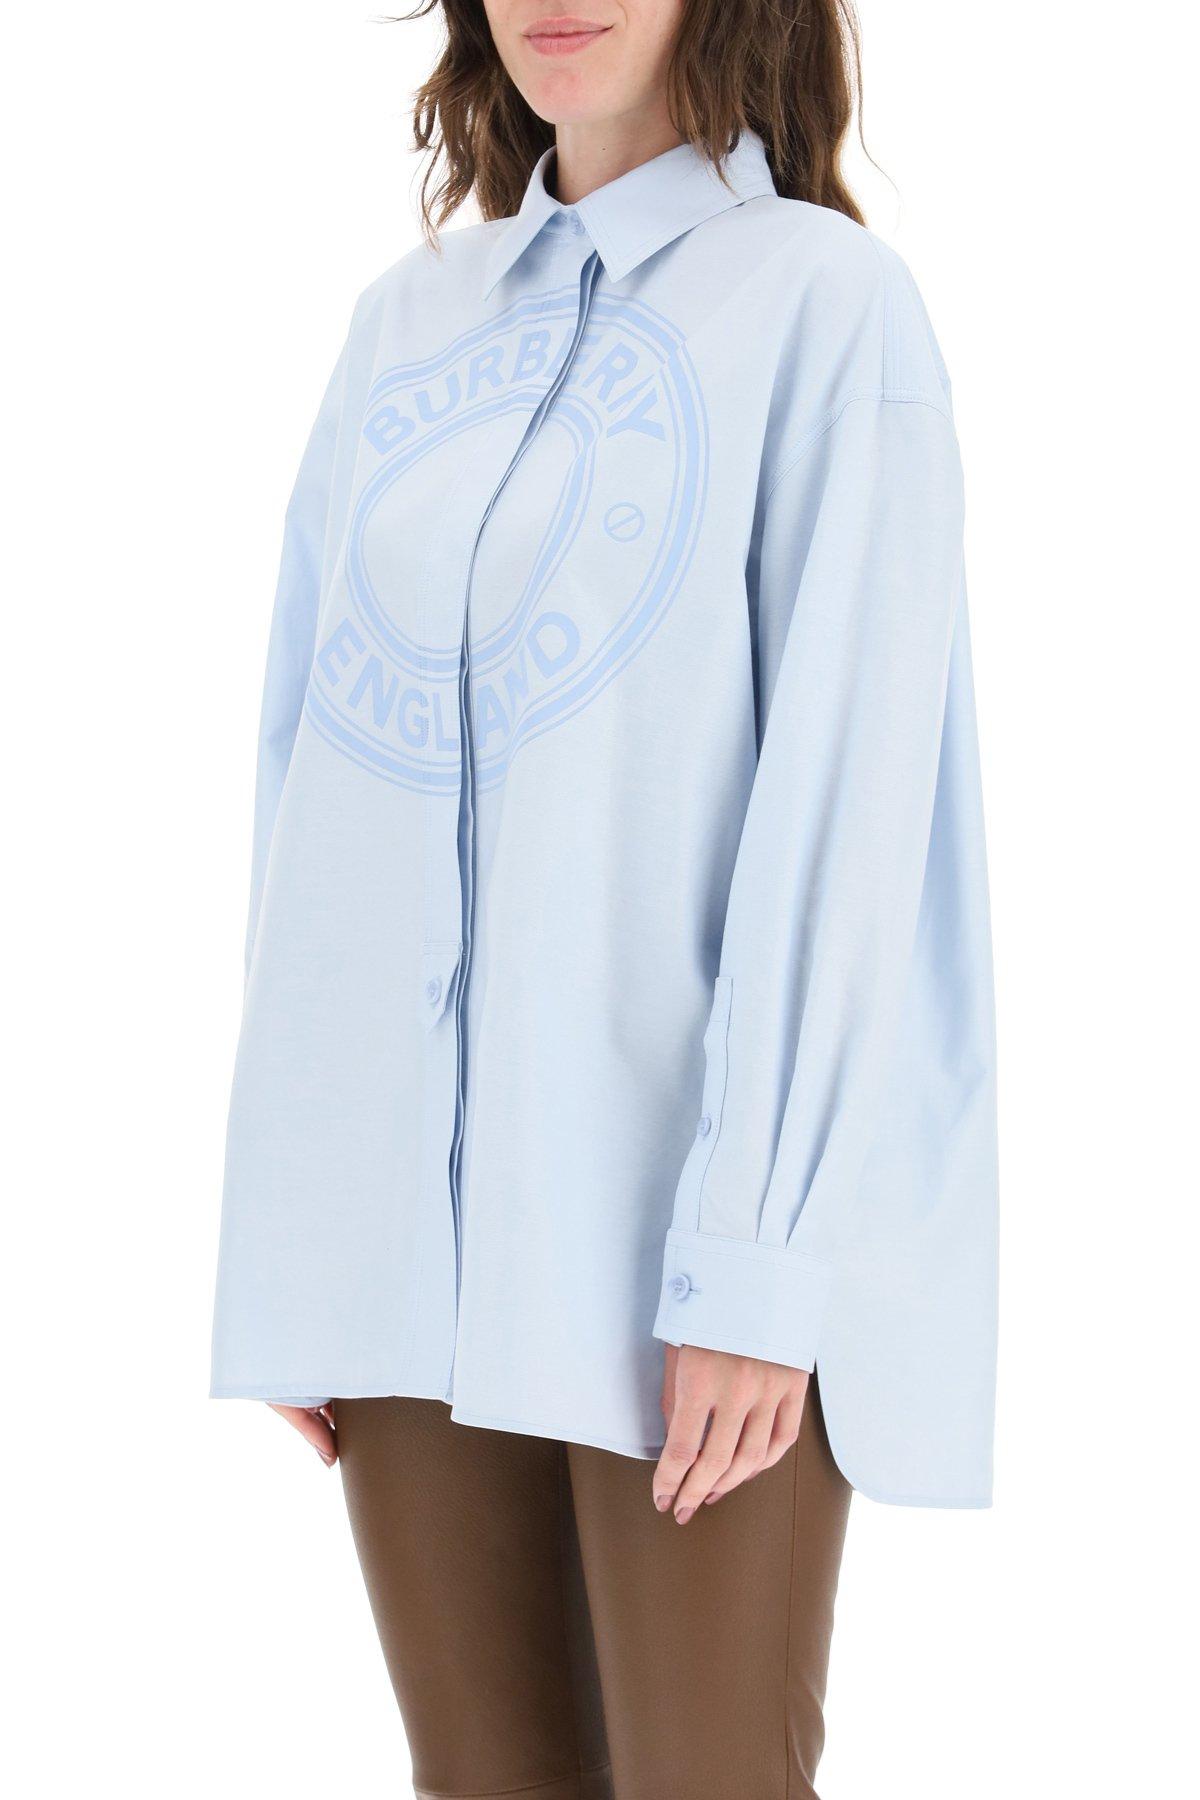 Burberry camicia oversize con logo